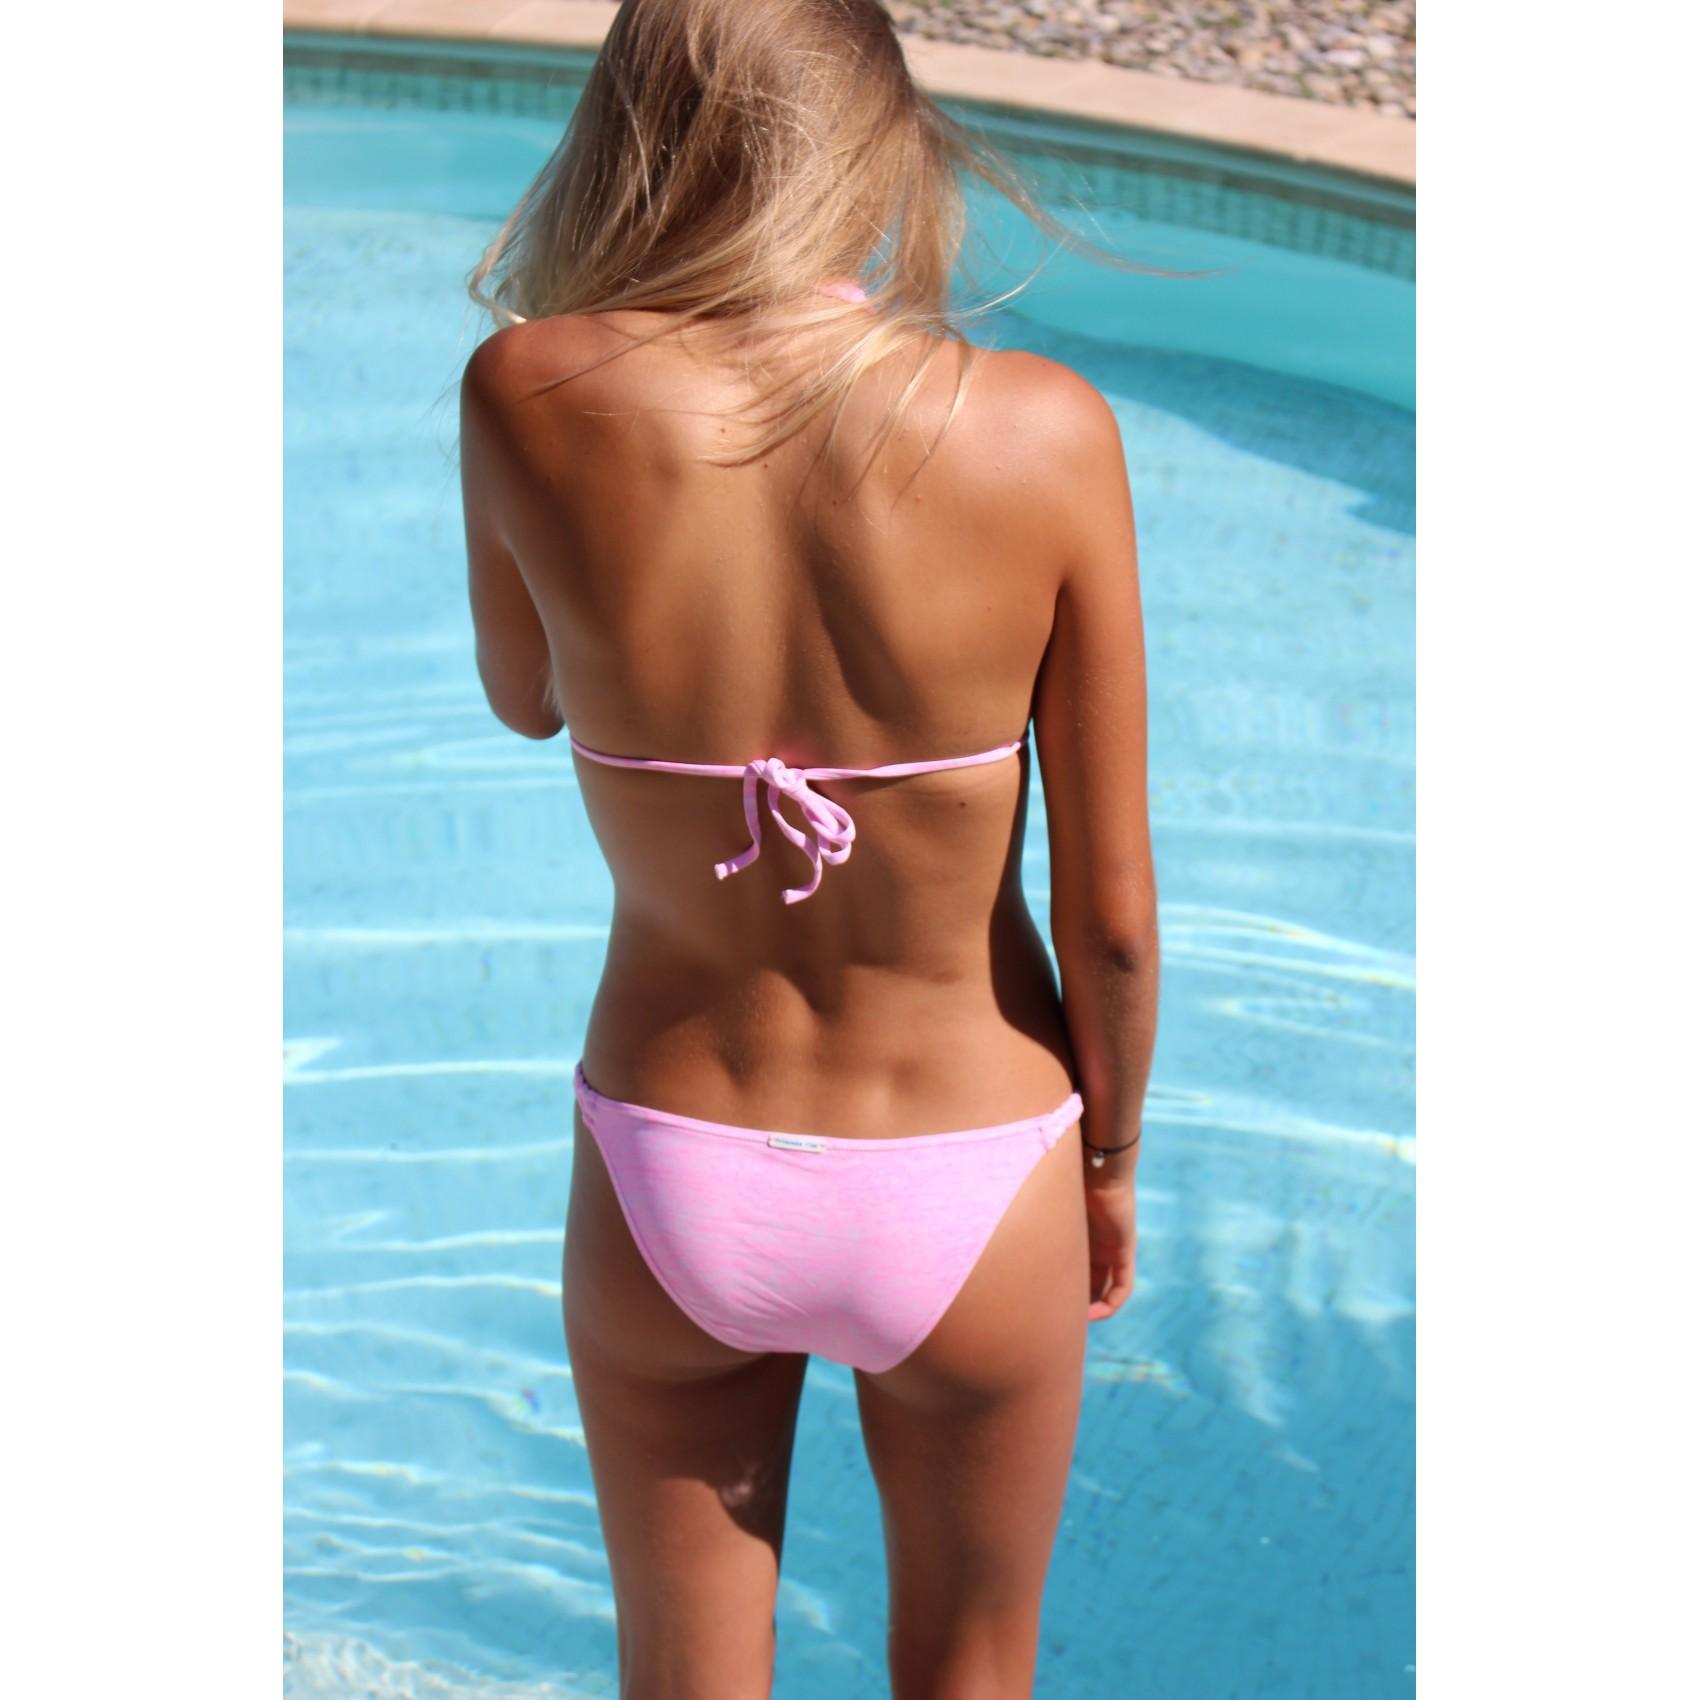 Adolescent en culotte rose